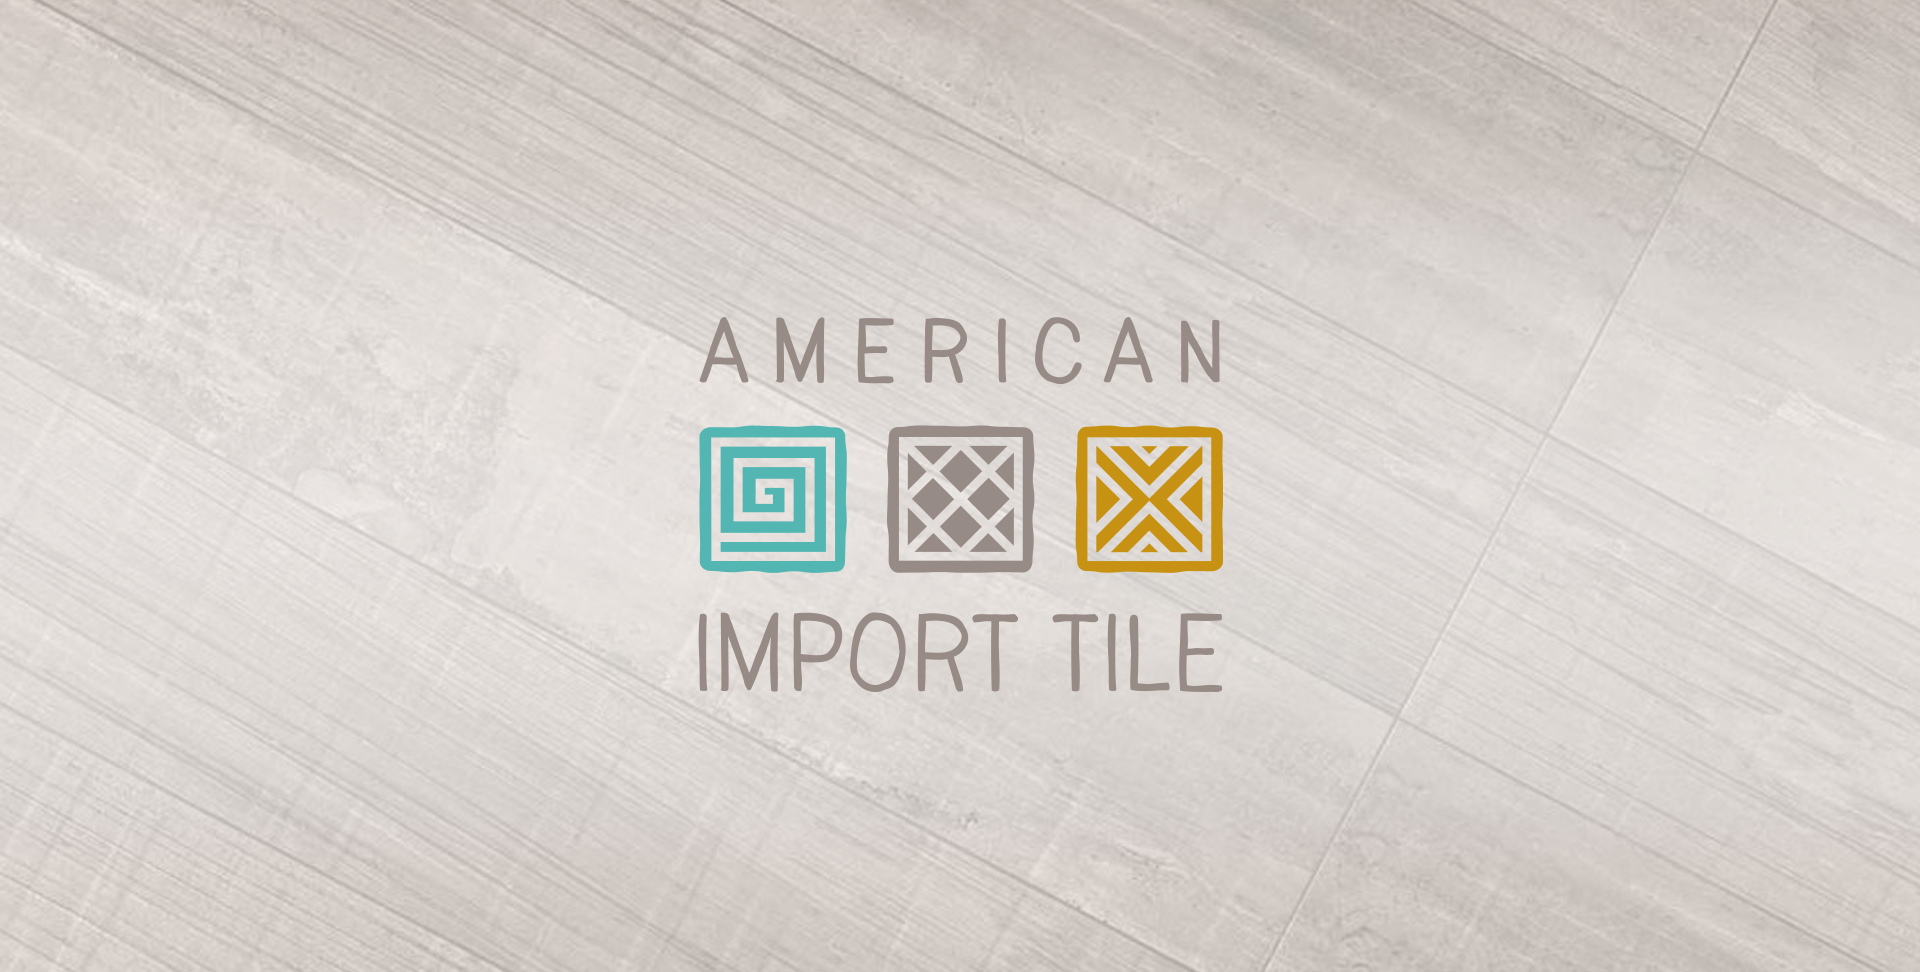 american import tile logo design